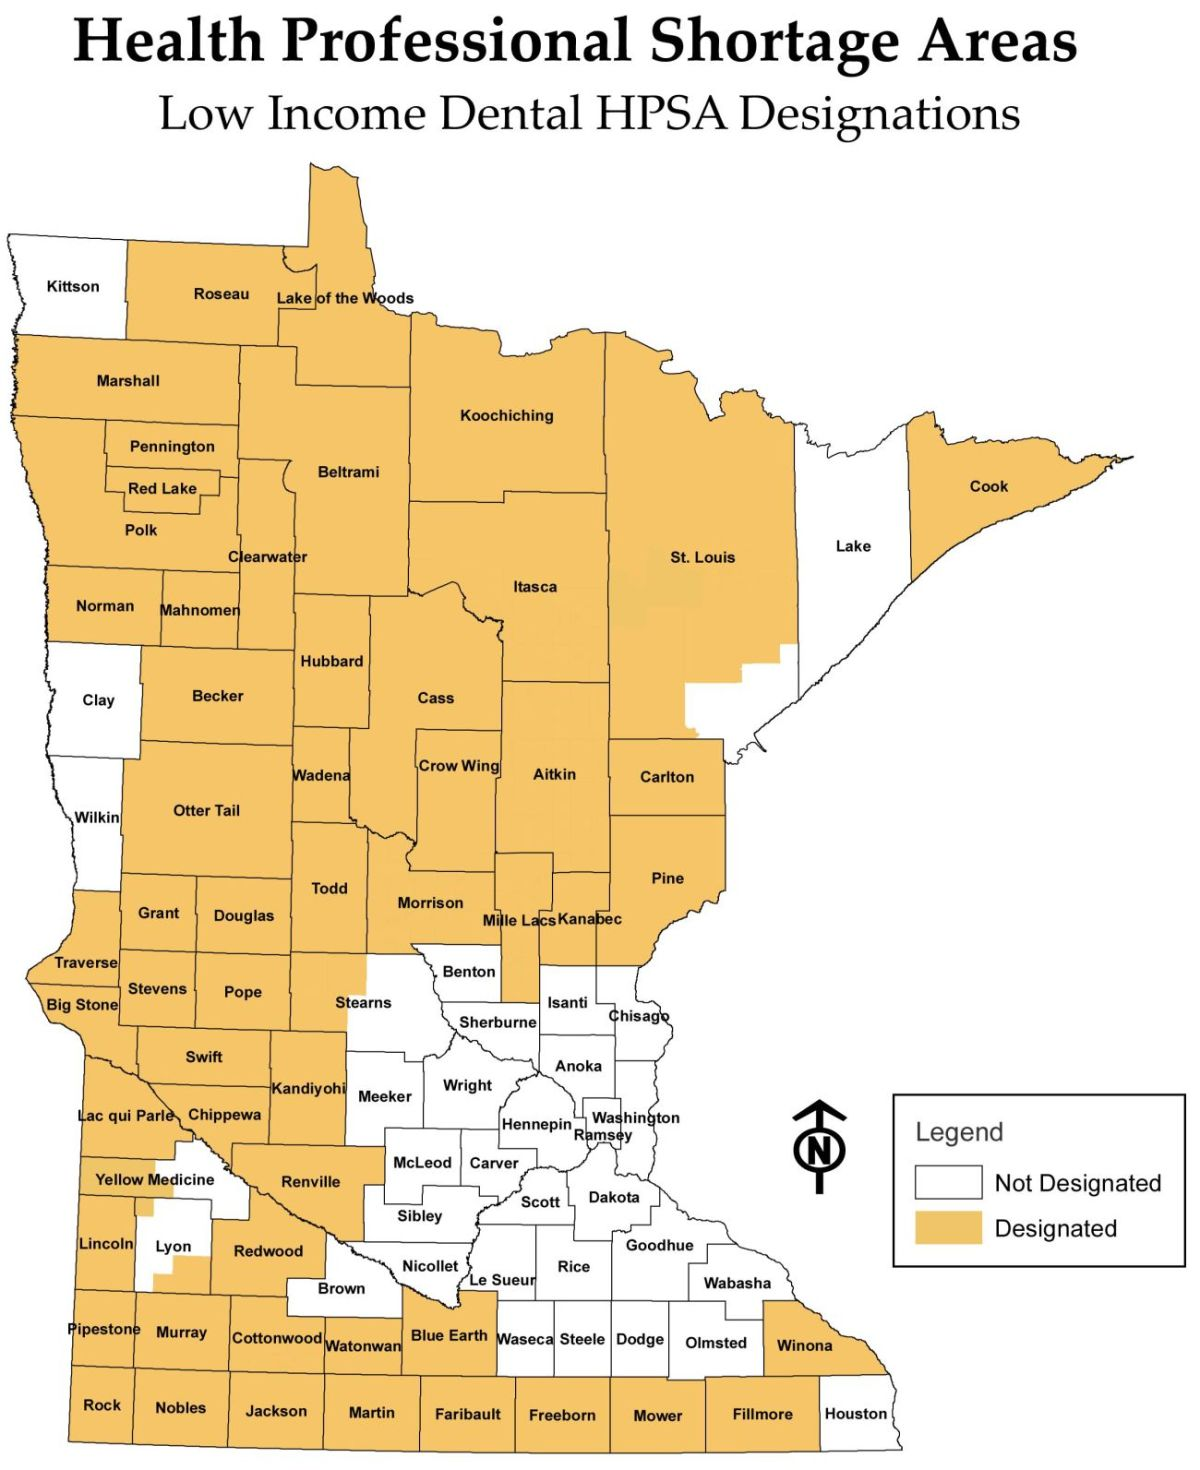 medium resolution of health professional shortage areas hspa low income dental hpsa designations minnesota